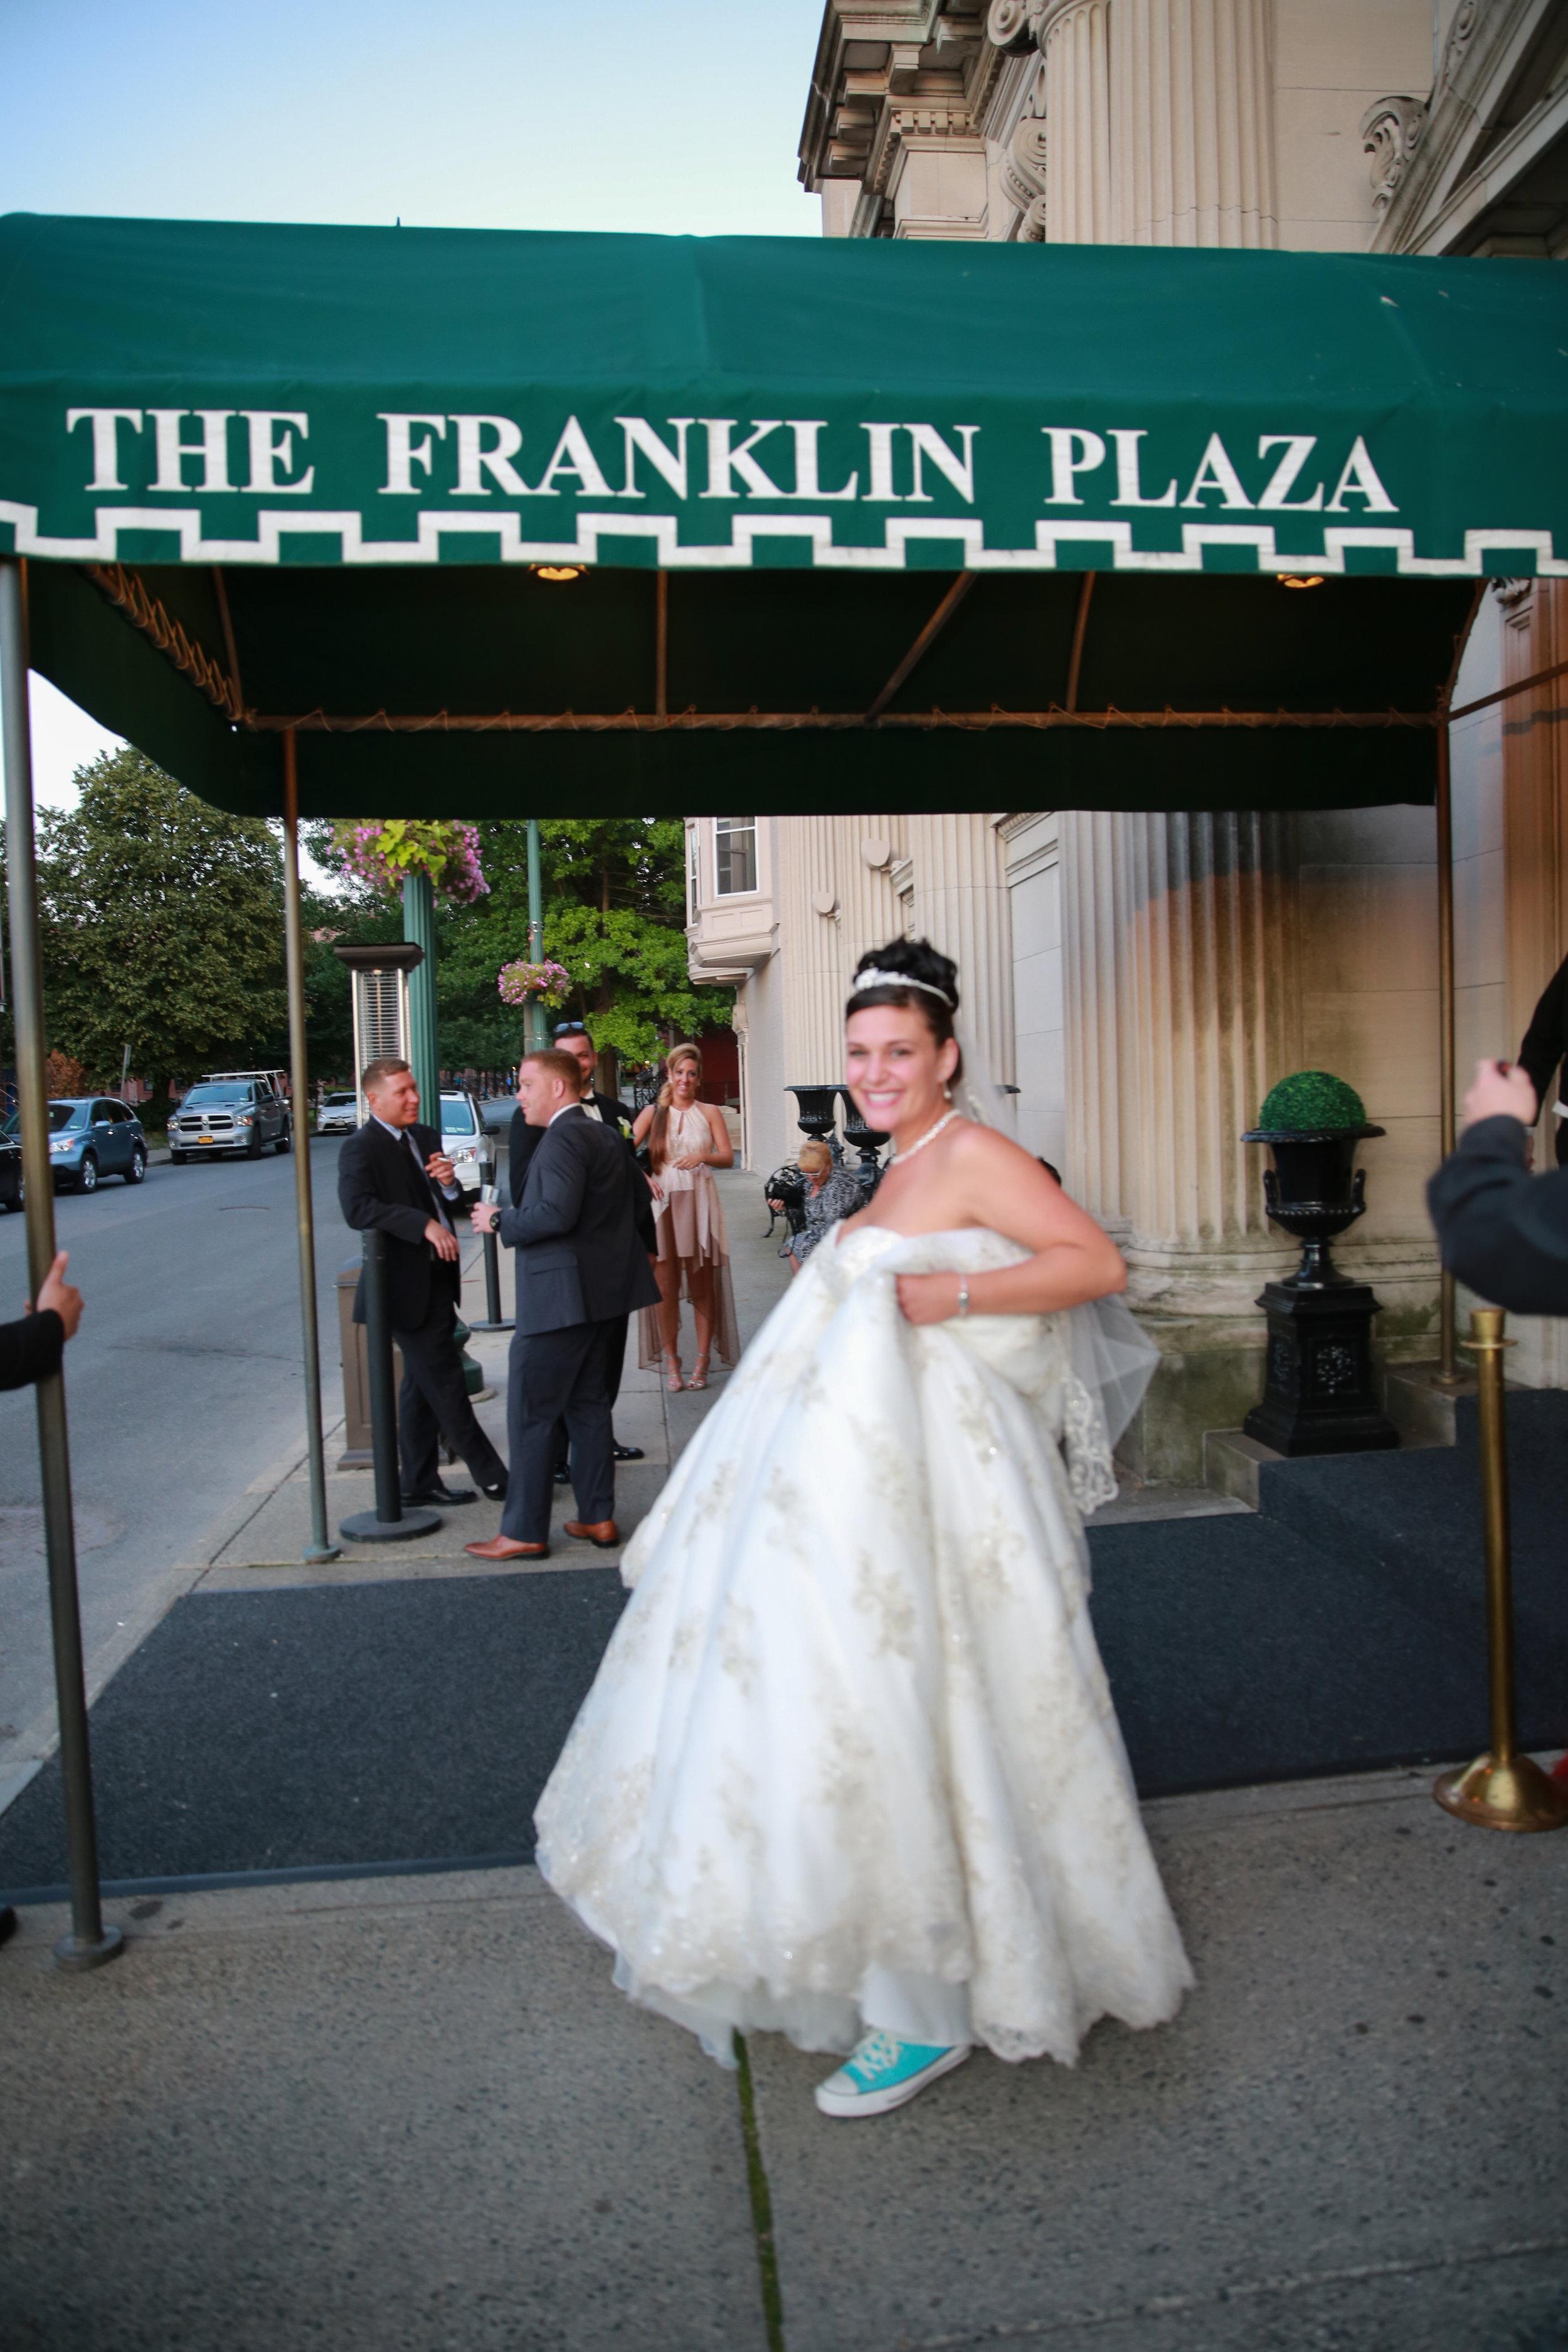 The Franklin Plaza in Schenectady